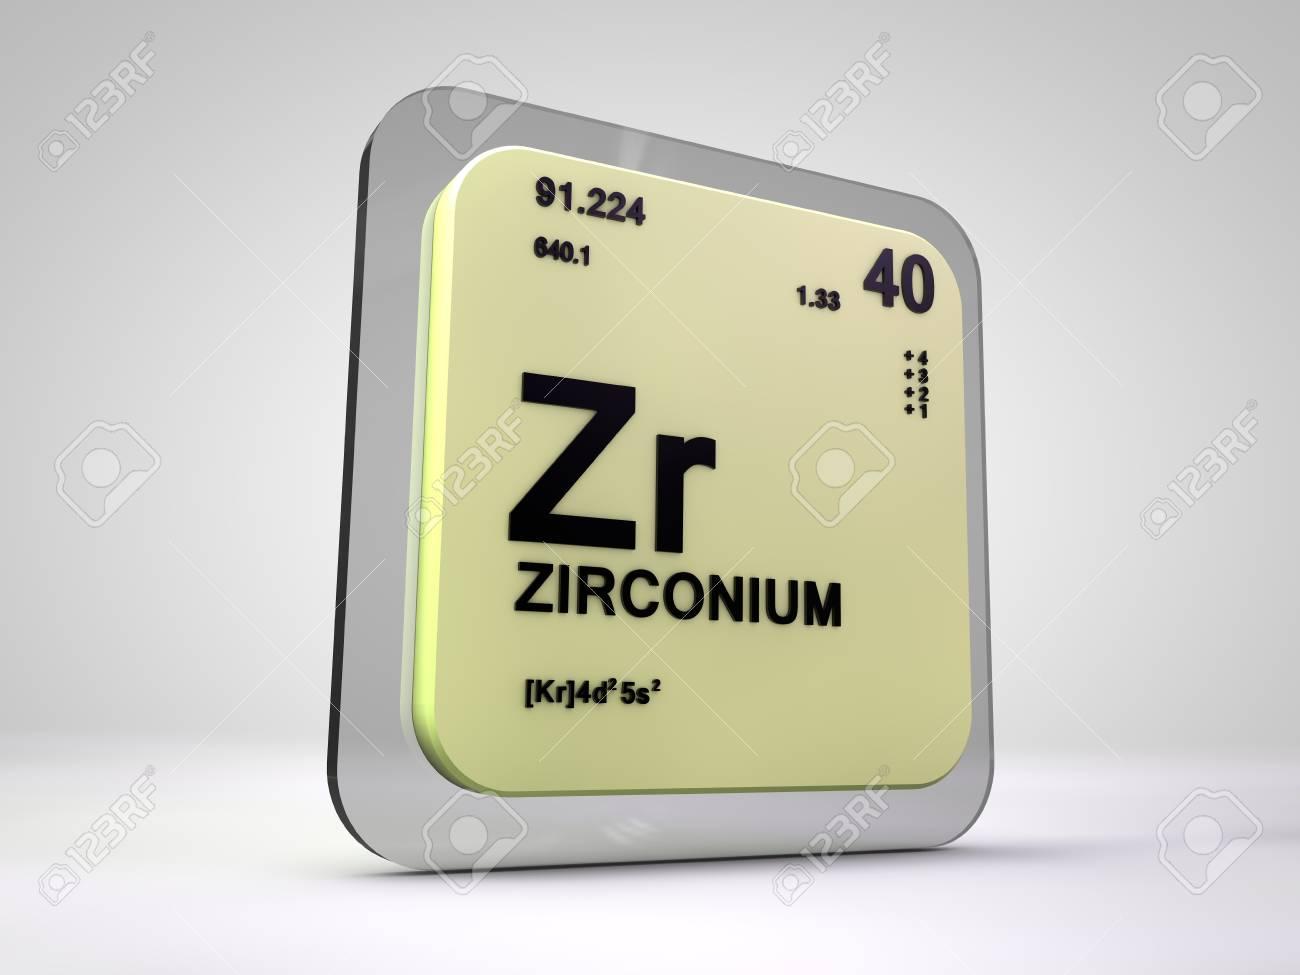 Zirconium zr chemical element periodic table 3d render stock stock photo zirconium zr chemical element periodic table 3d render urtaz Gallery